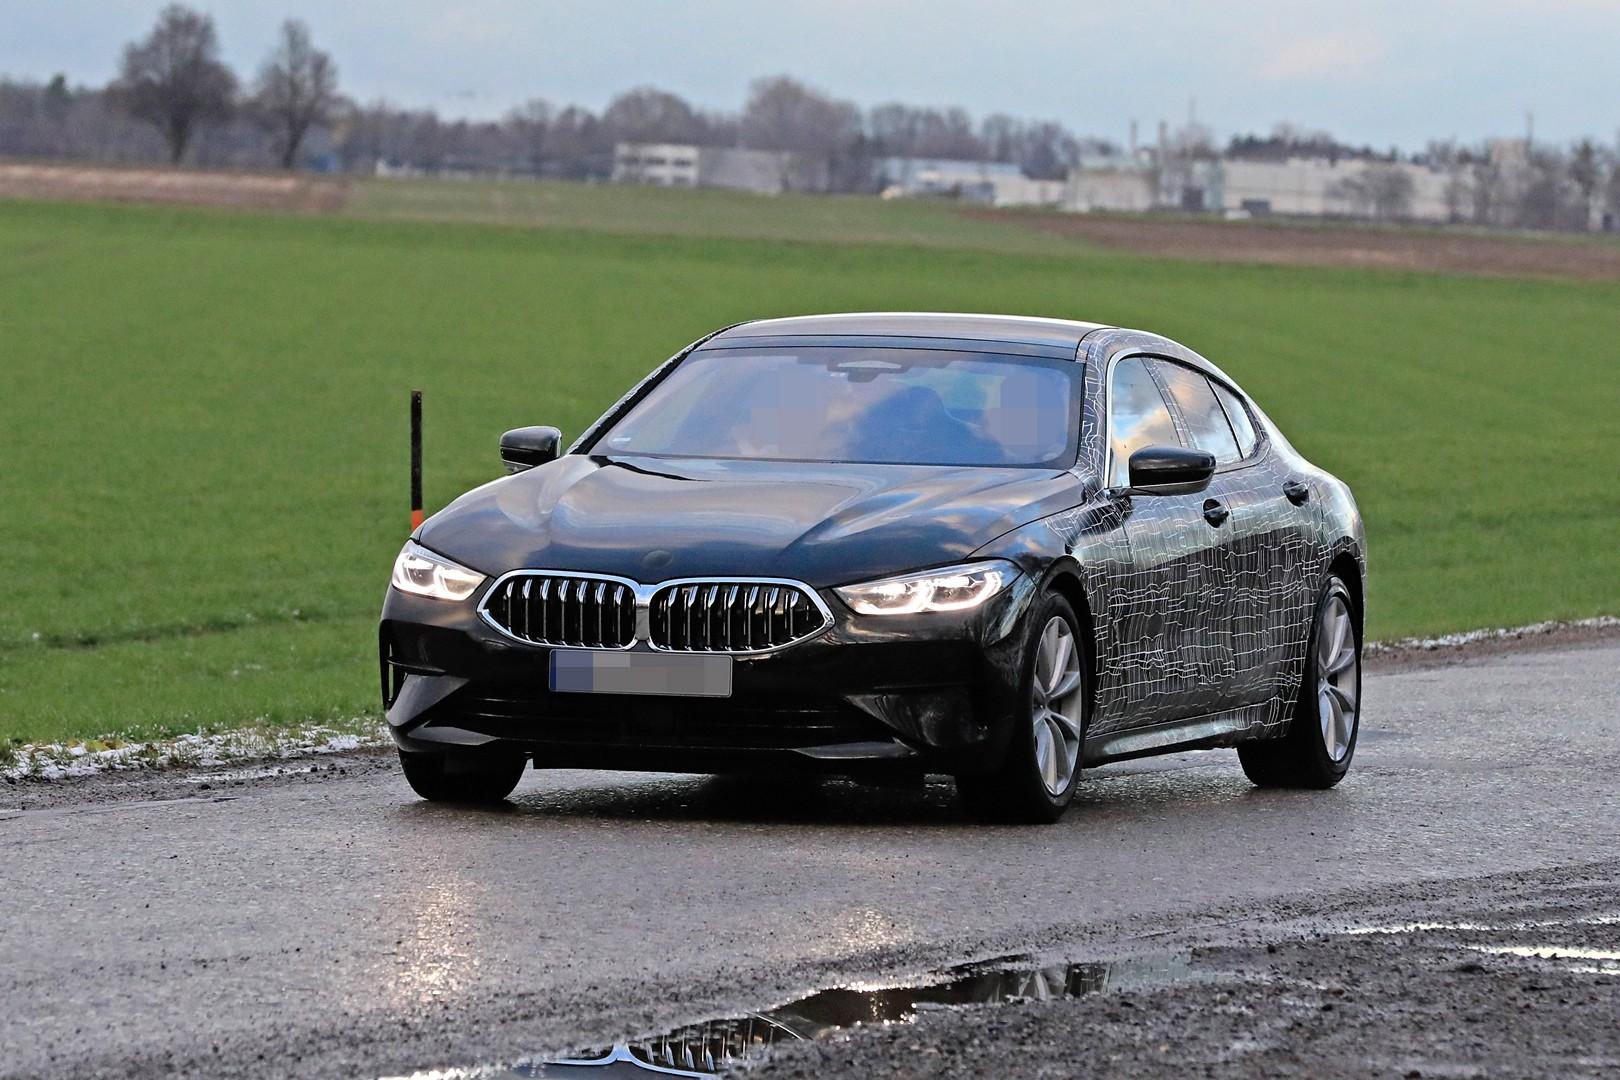 2020 bmw 8 series gran coupe looks boring in latest spyshots